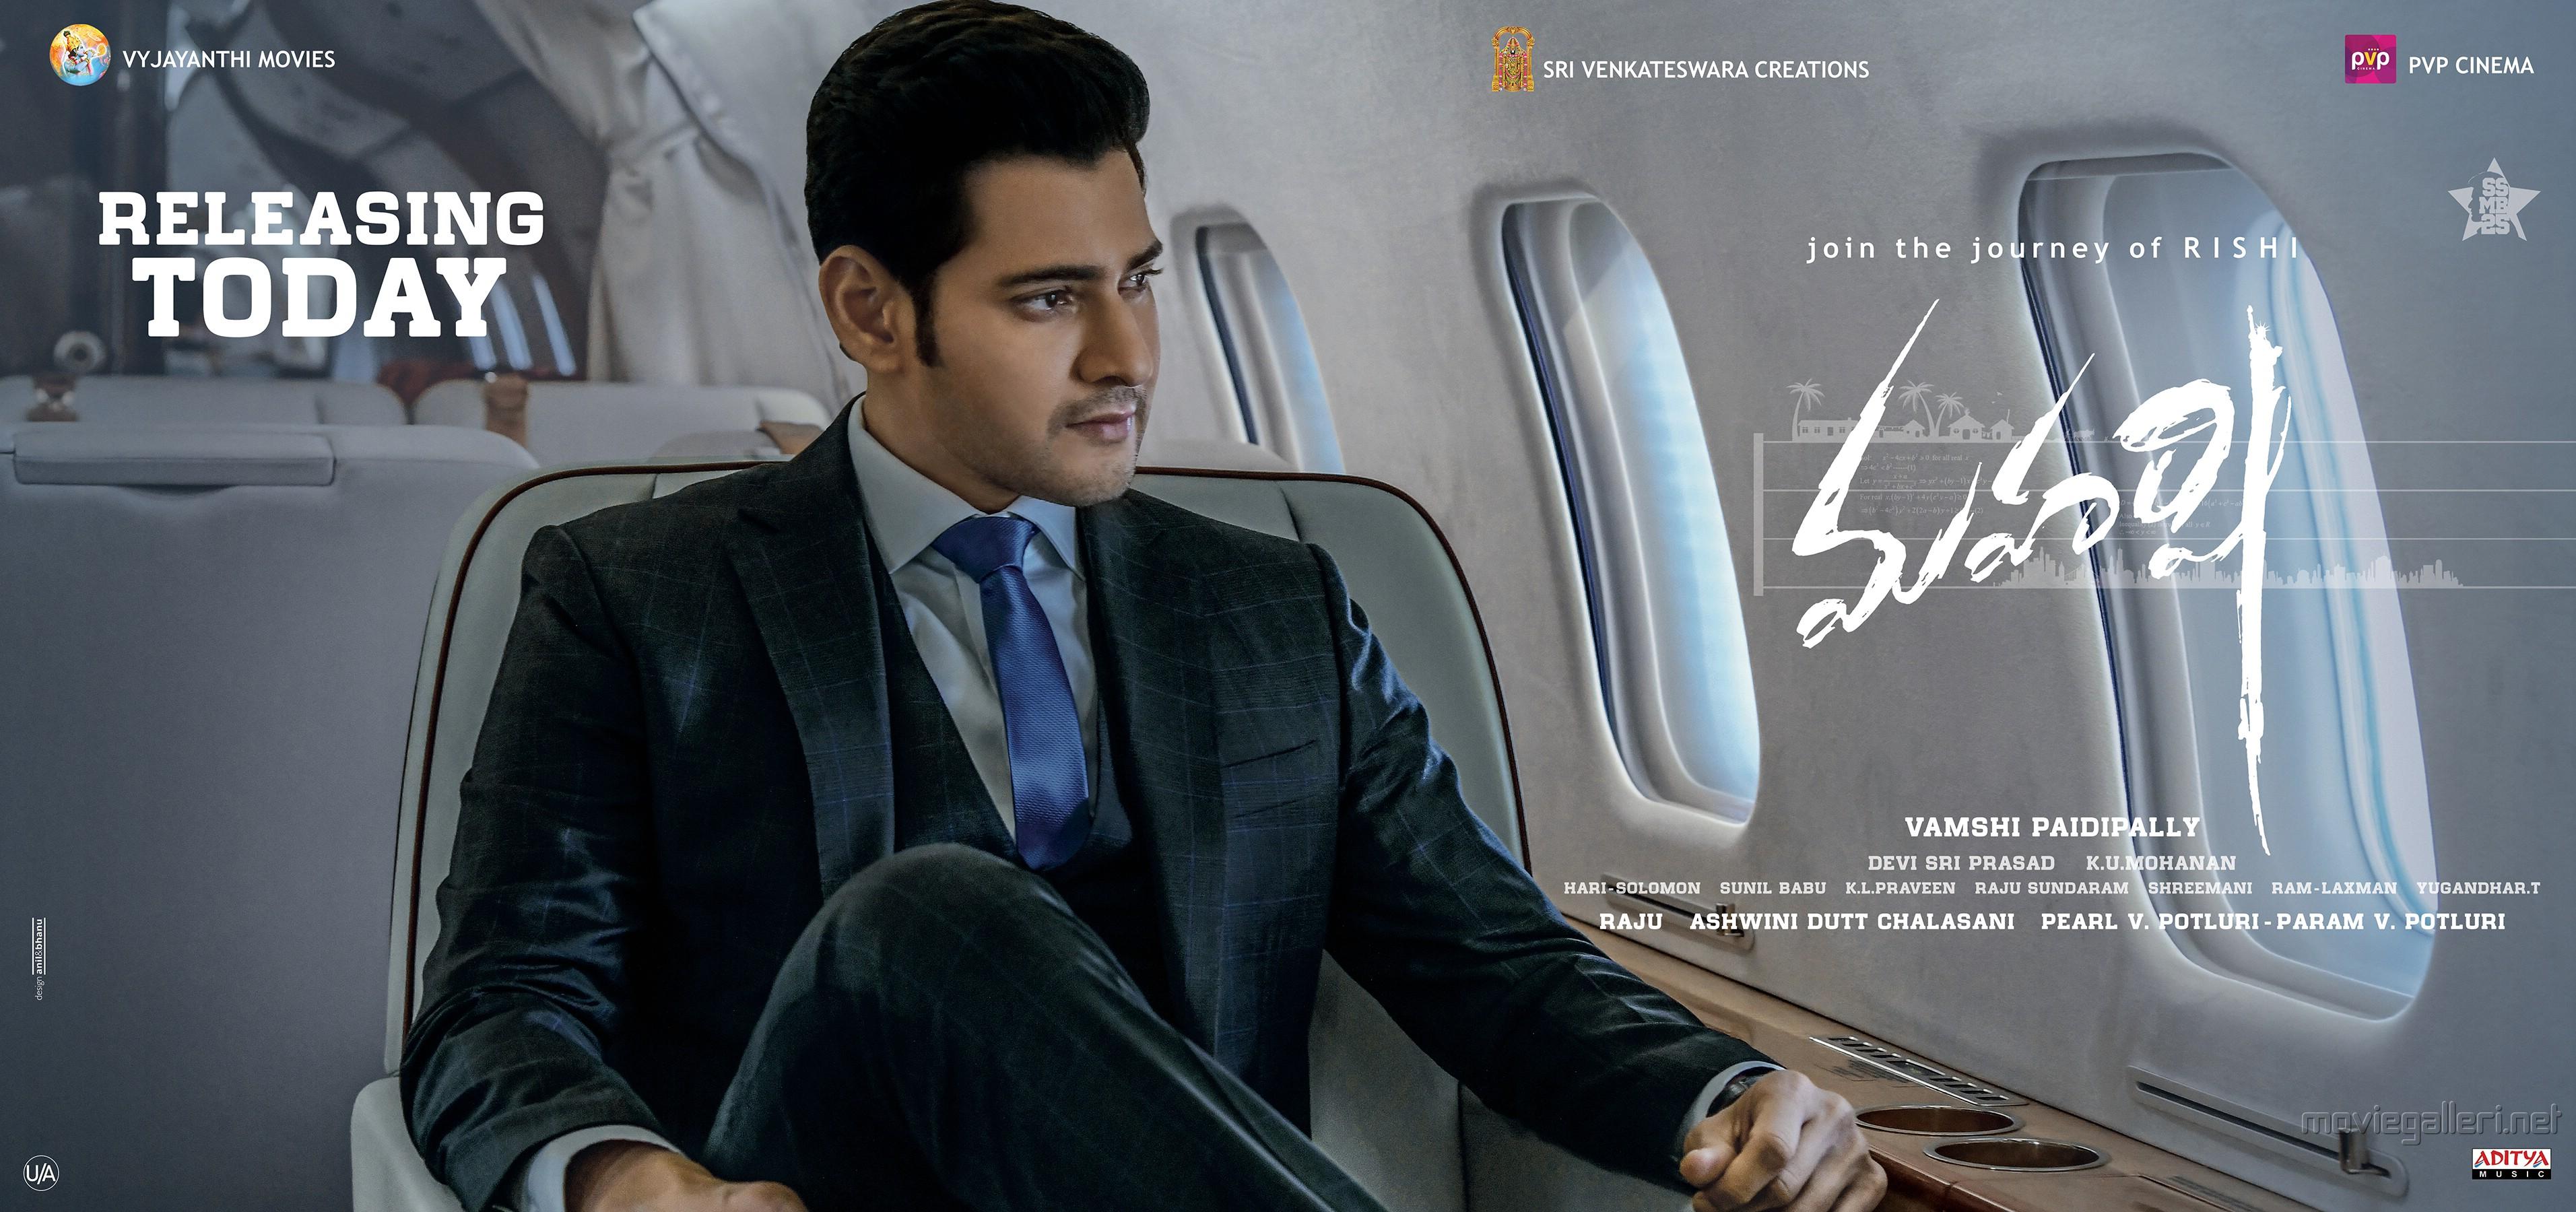 Mahesh Babu Maharshi Movie Releasing Today Posters HD